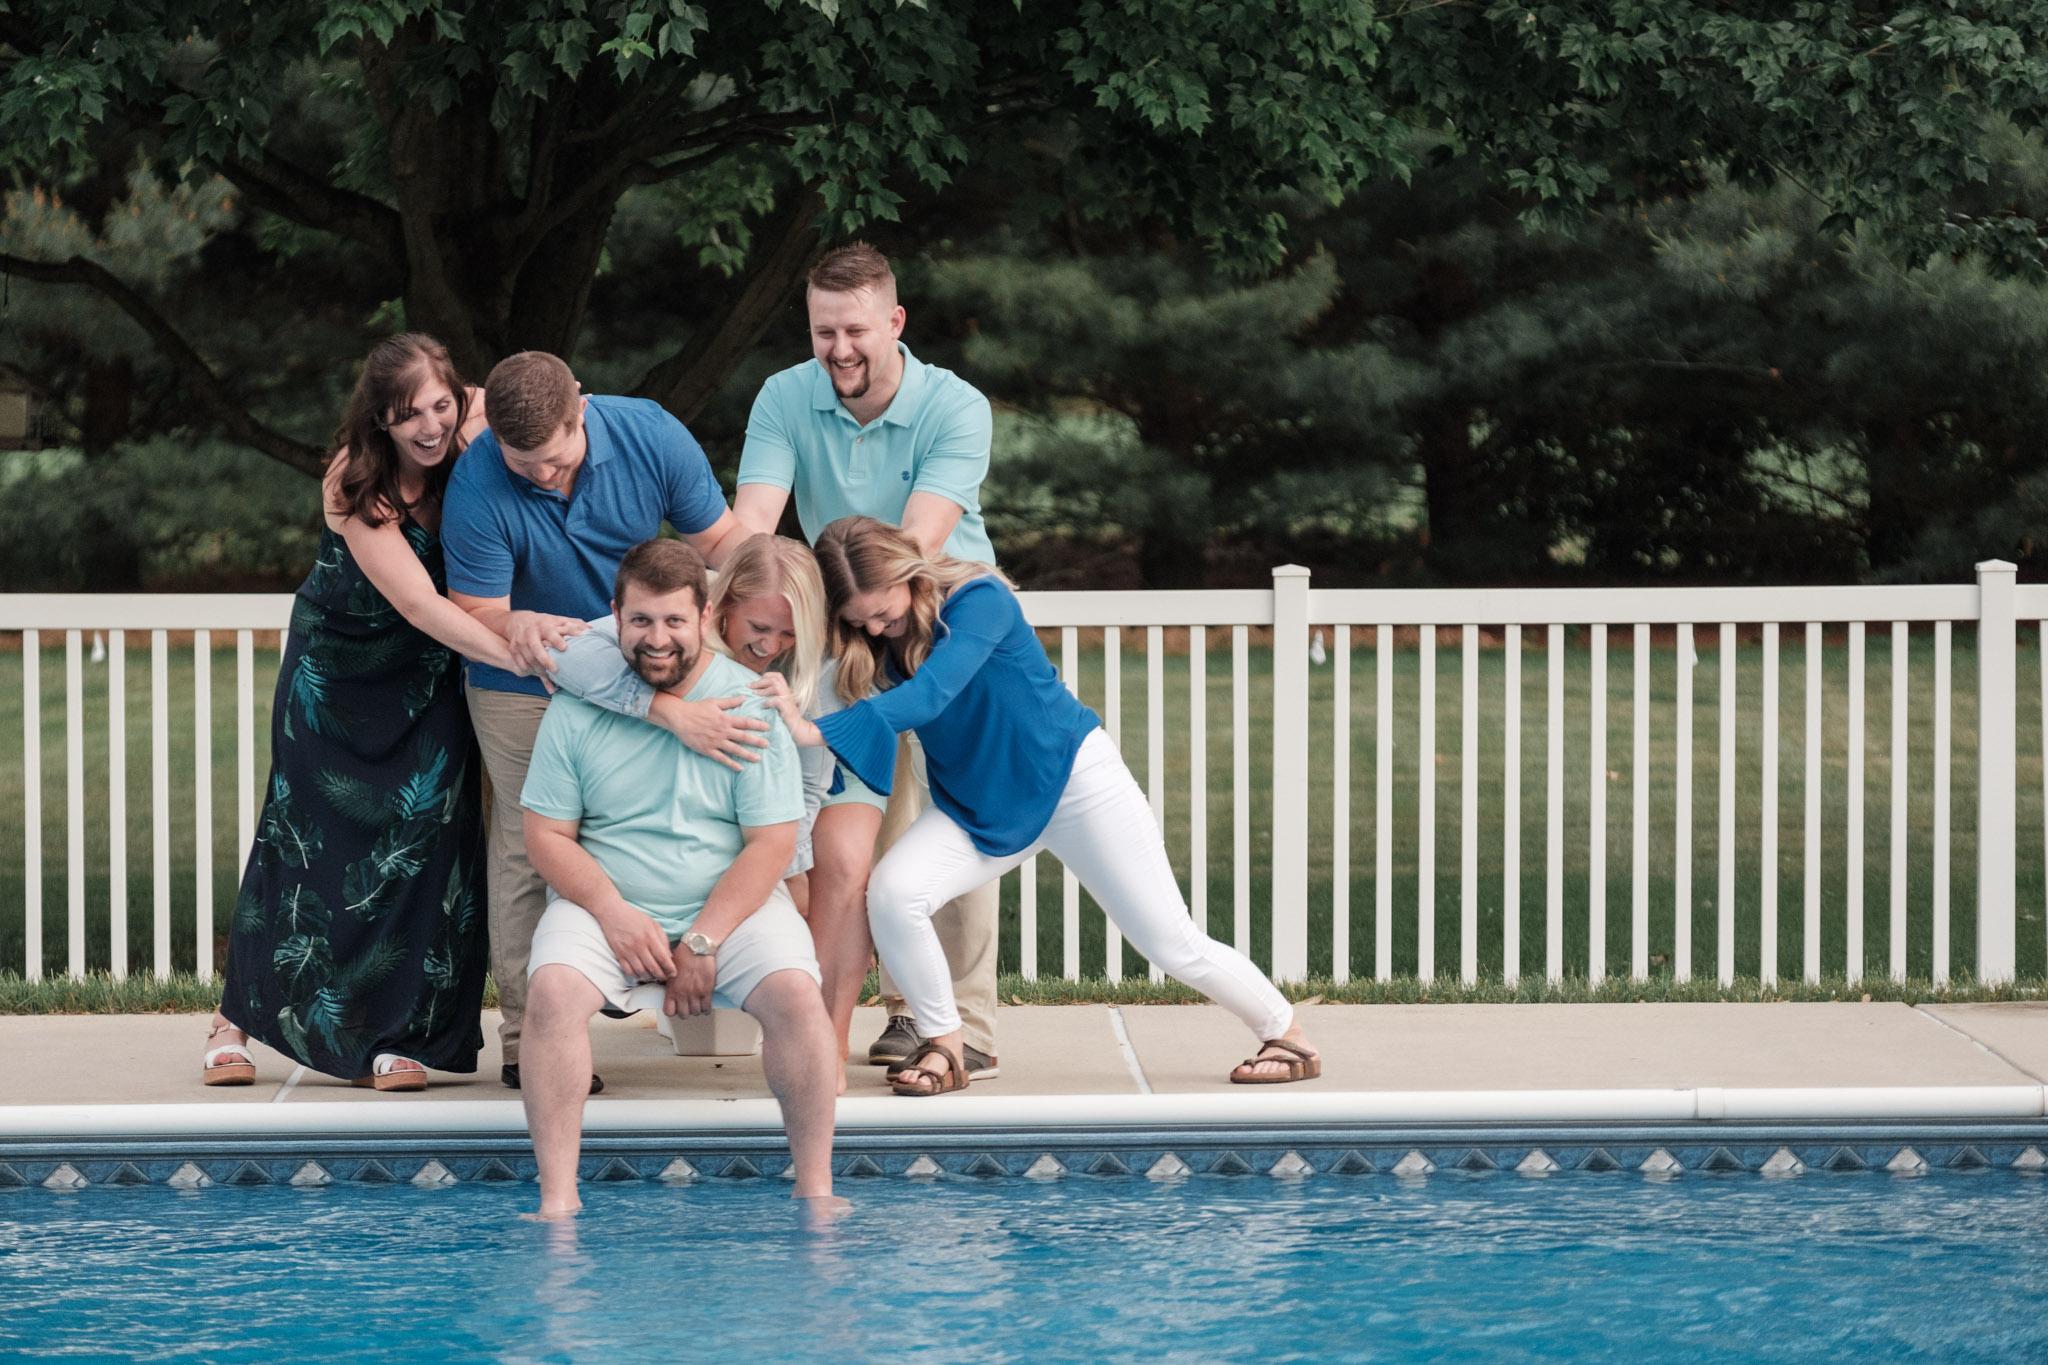 2018 BAP Vandiver Family Photos Roscoe-18.jpg